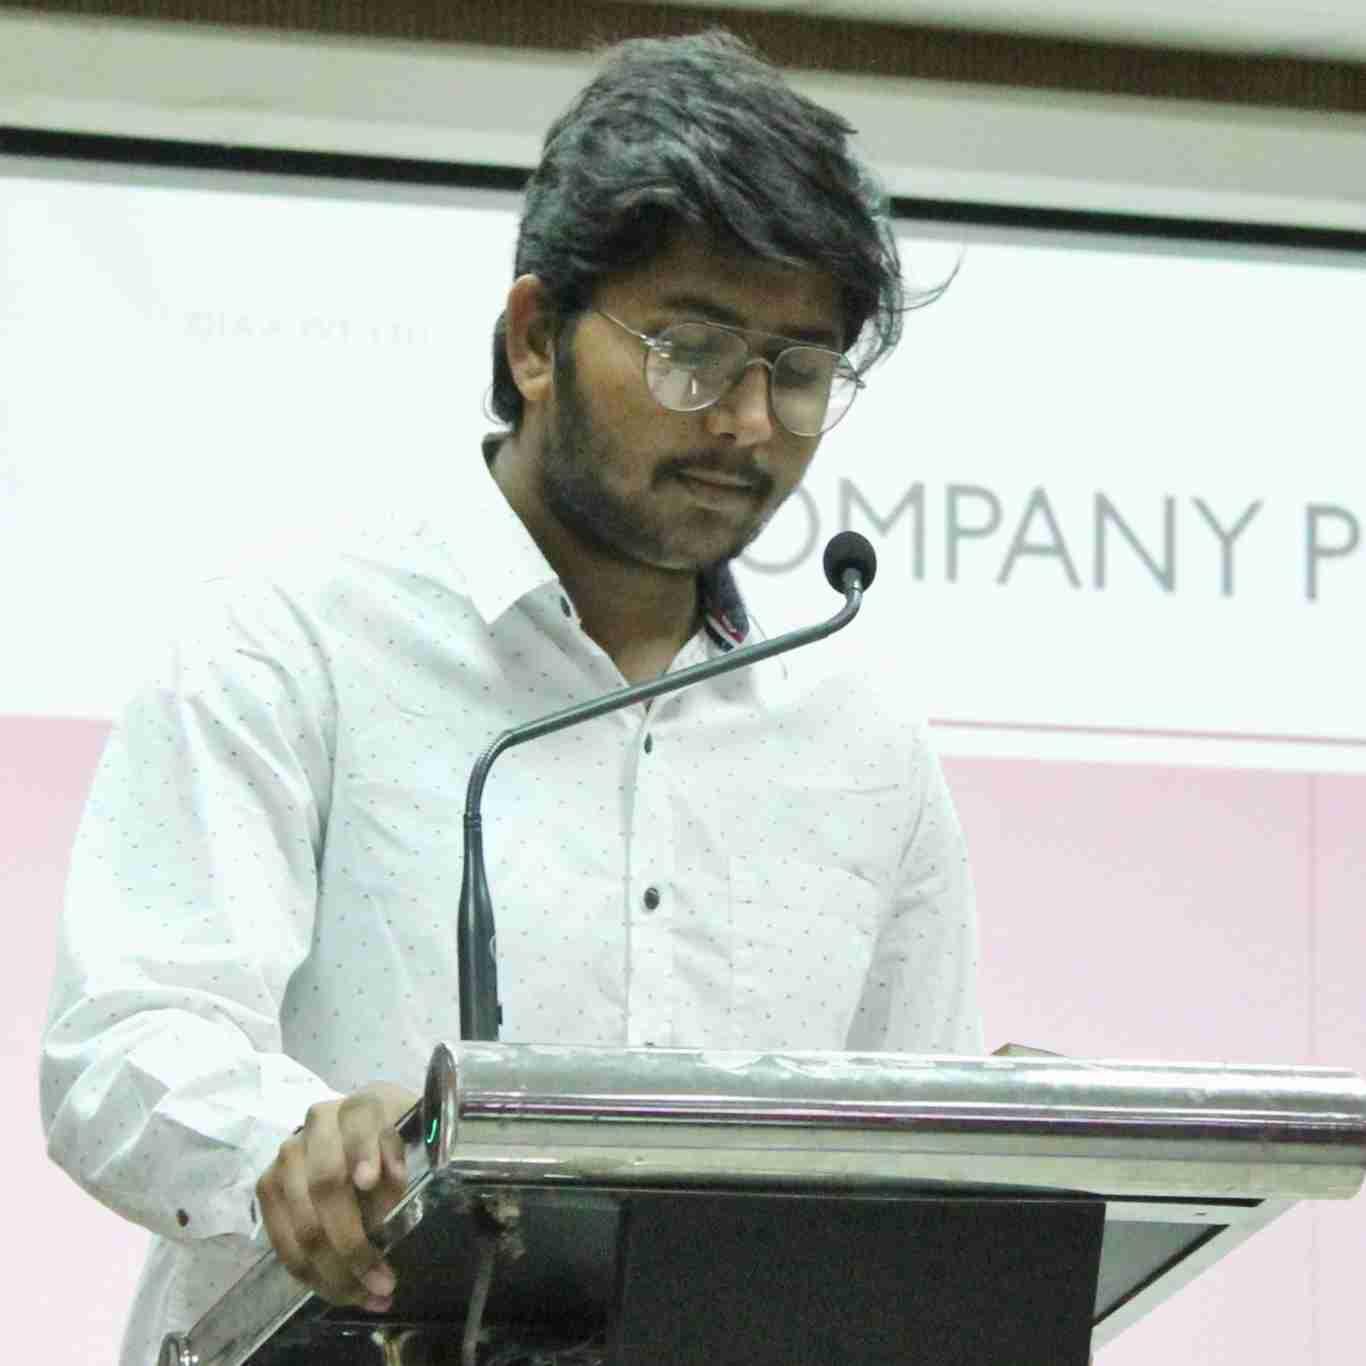 Kshitij RB Singh